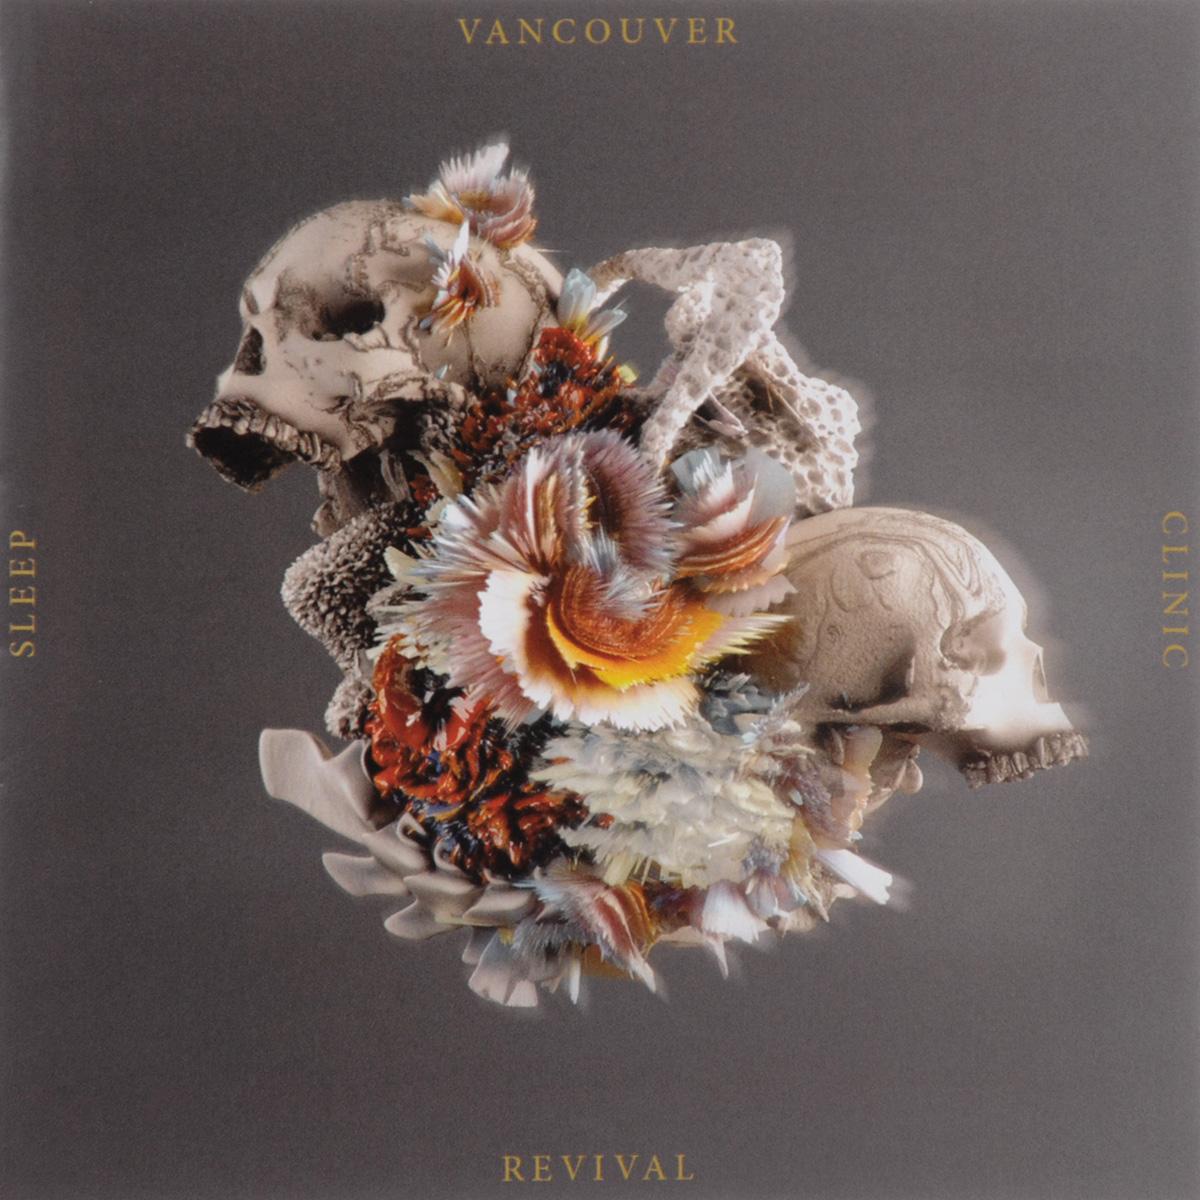 Vancouver Sleep Clinic Vancouver Sleep Clinic. Revival eric nam vancouver